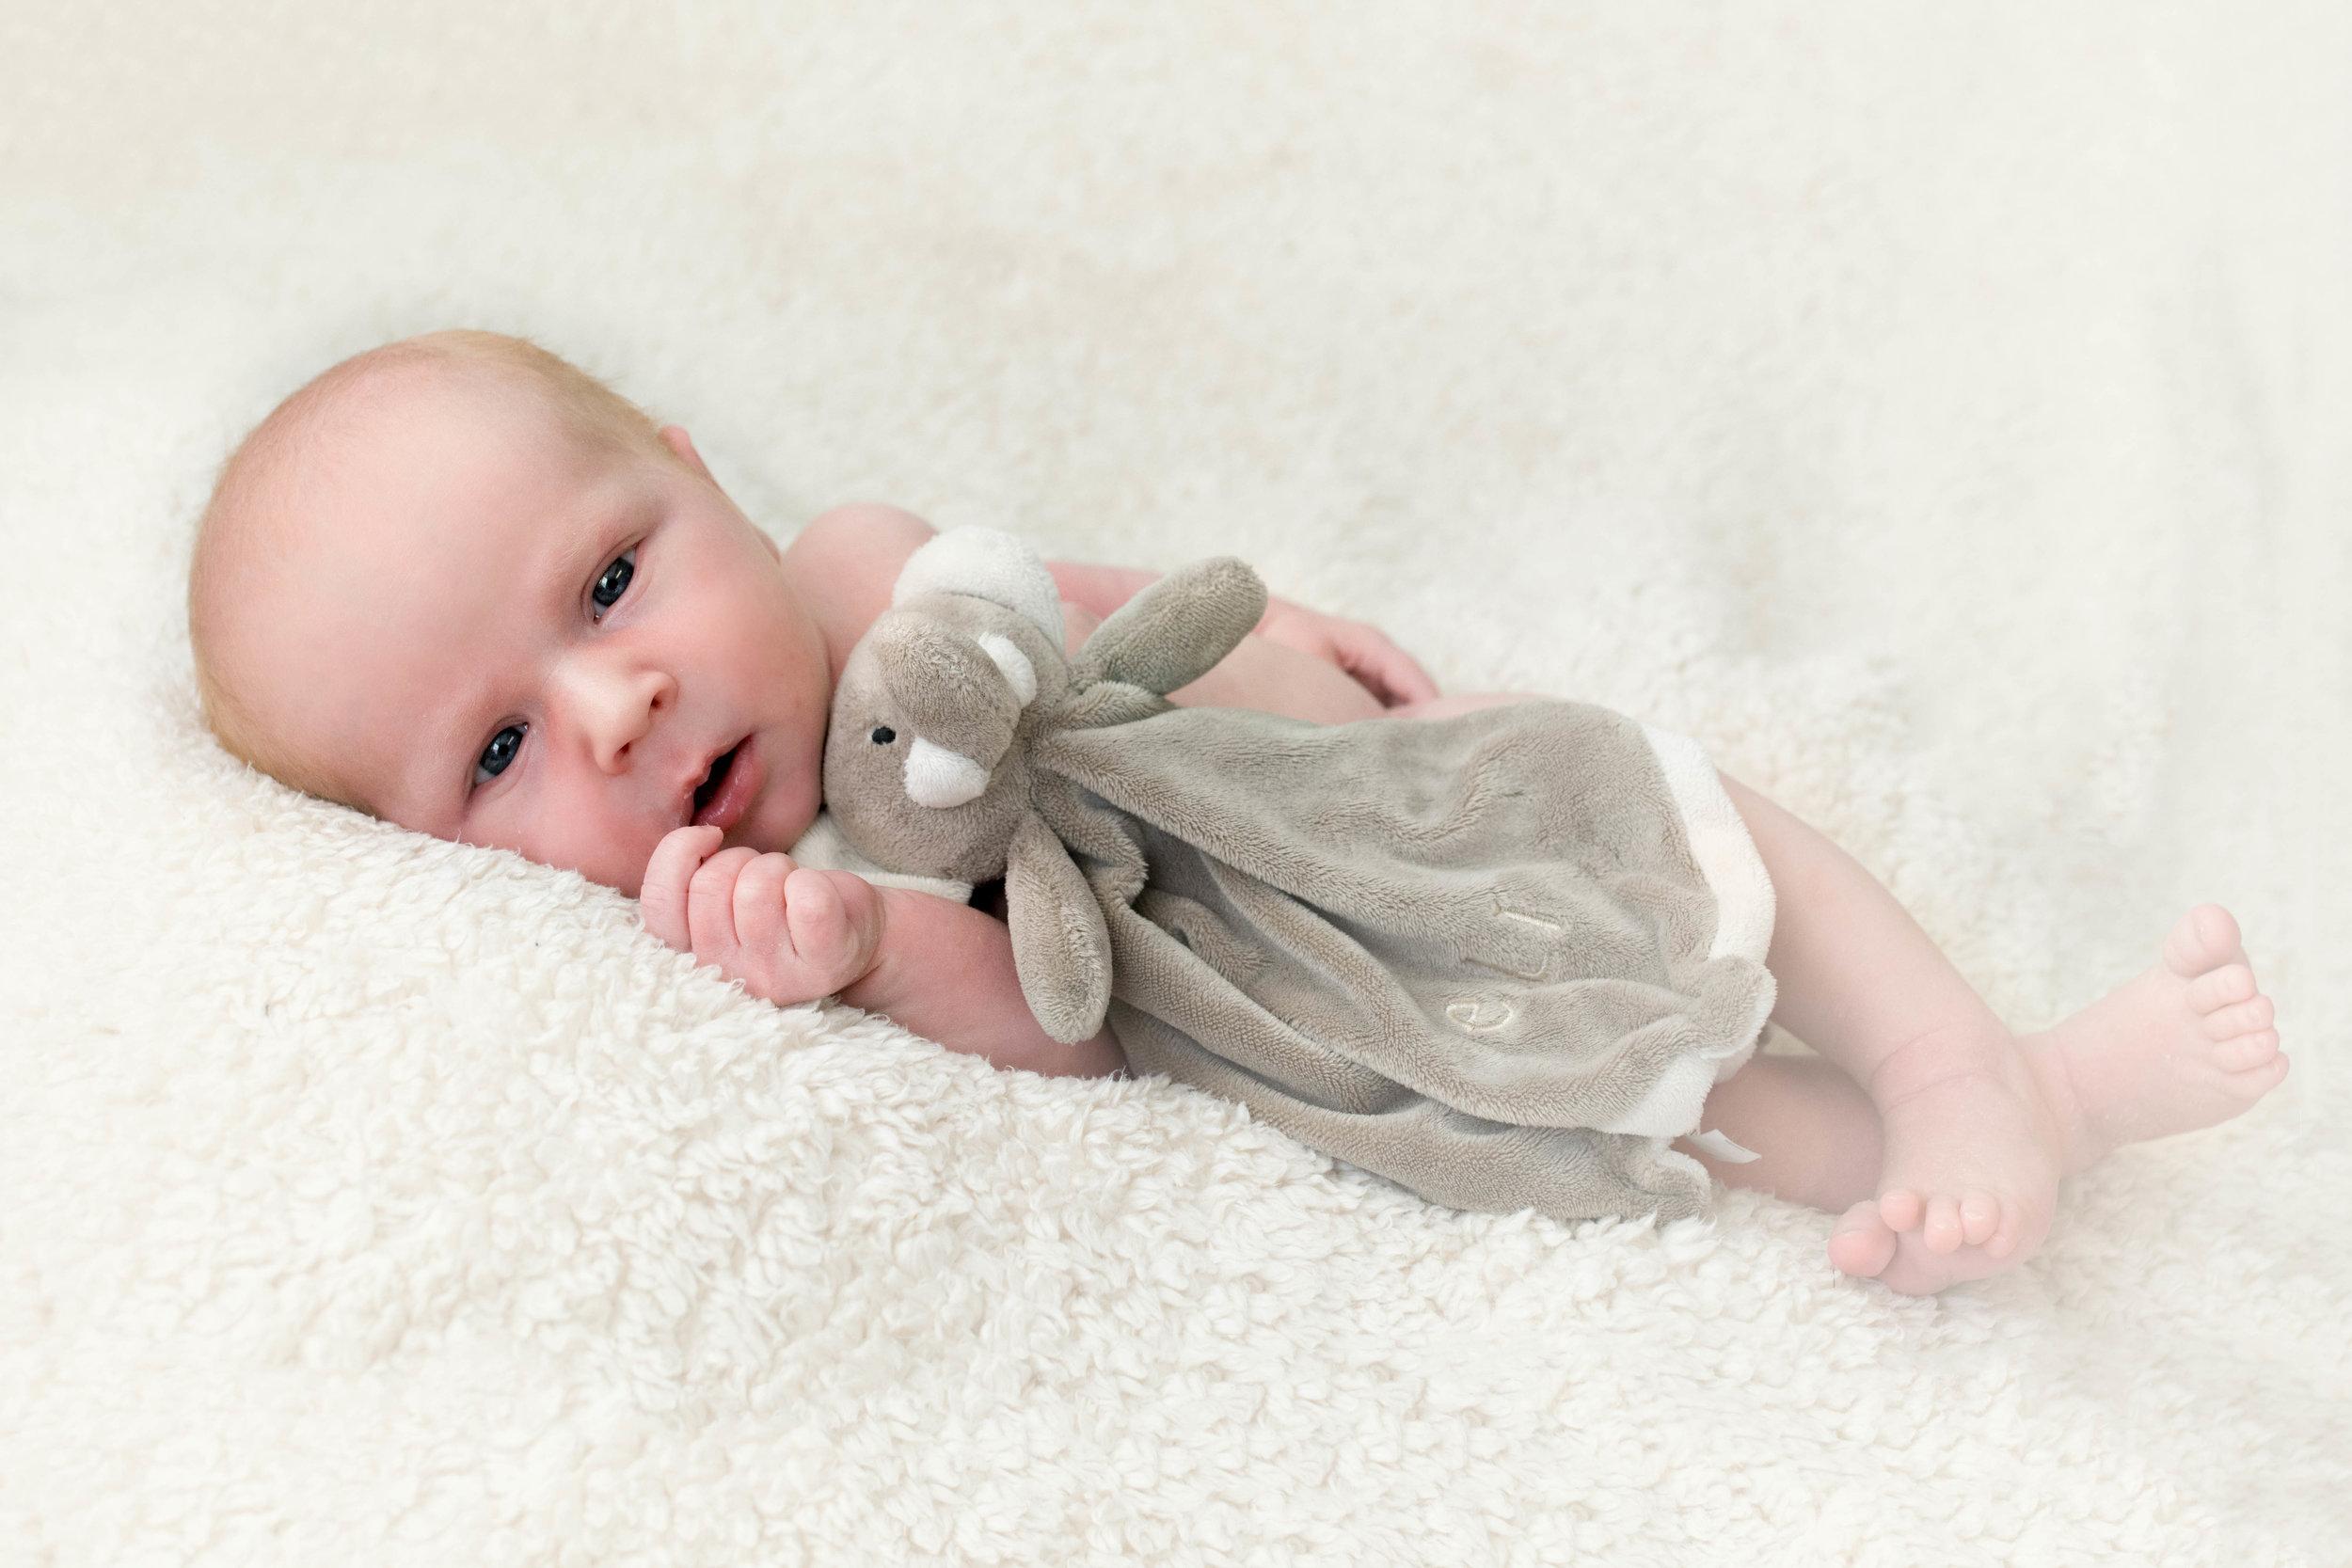 newborn-photographer-glasgow-open-eyes-with-elephant-toy